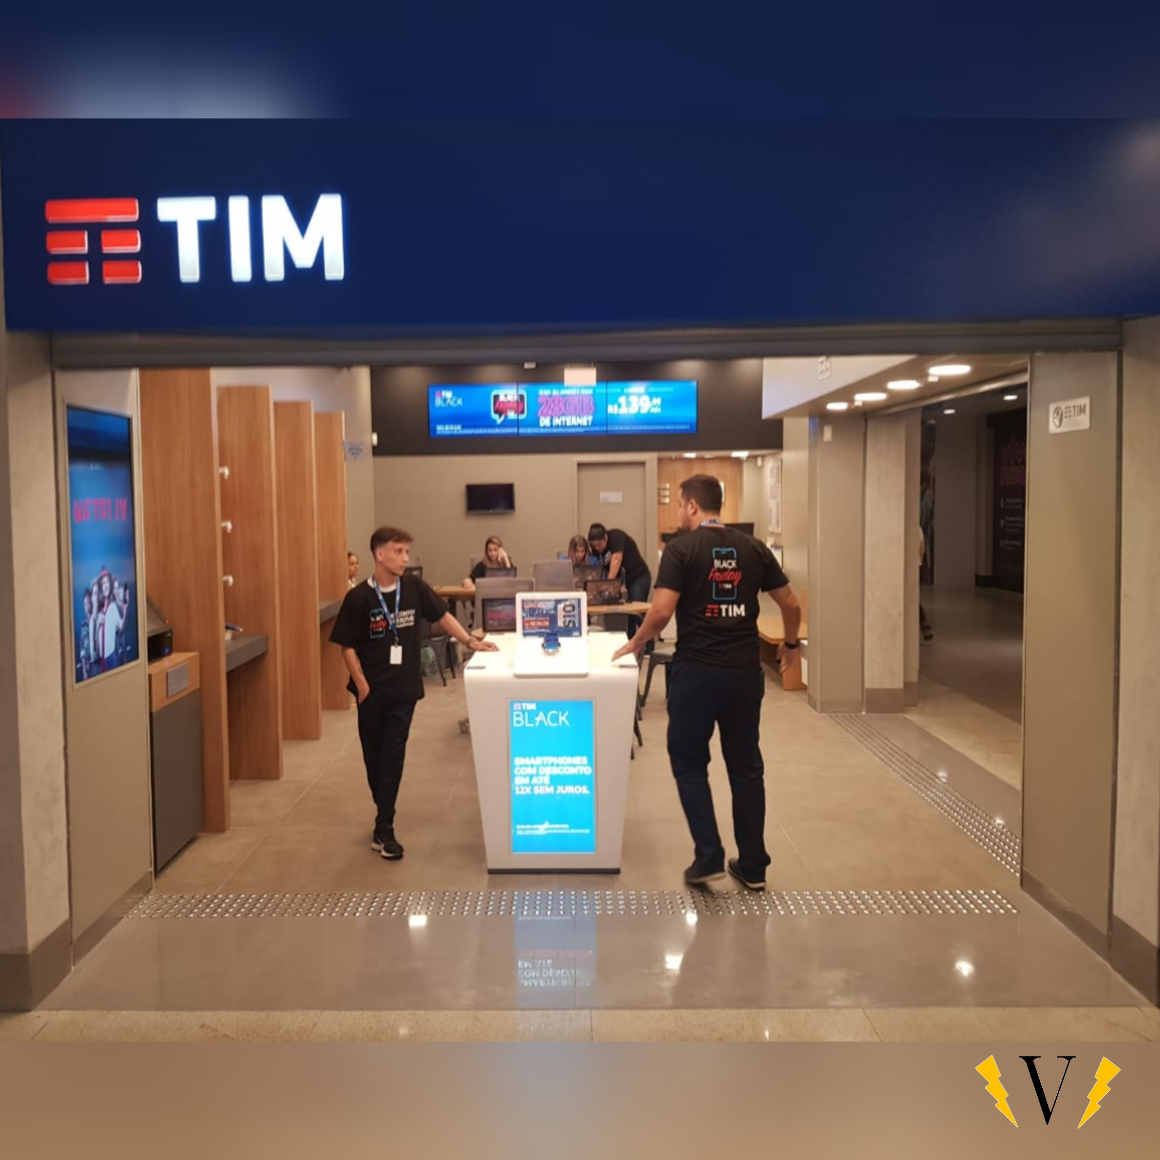 Instalação Elétrica de Loja - TIM